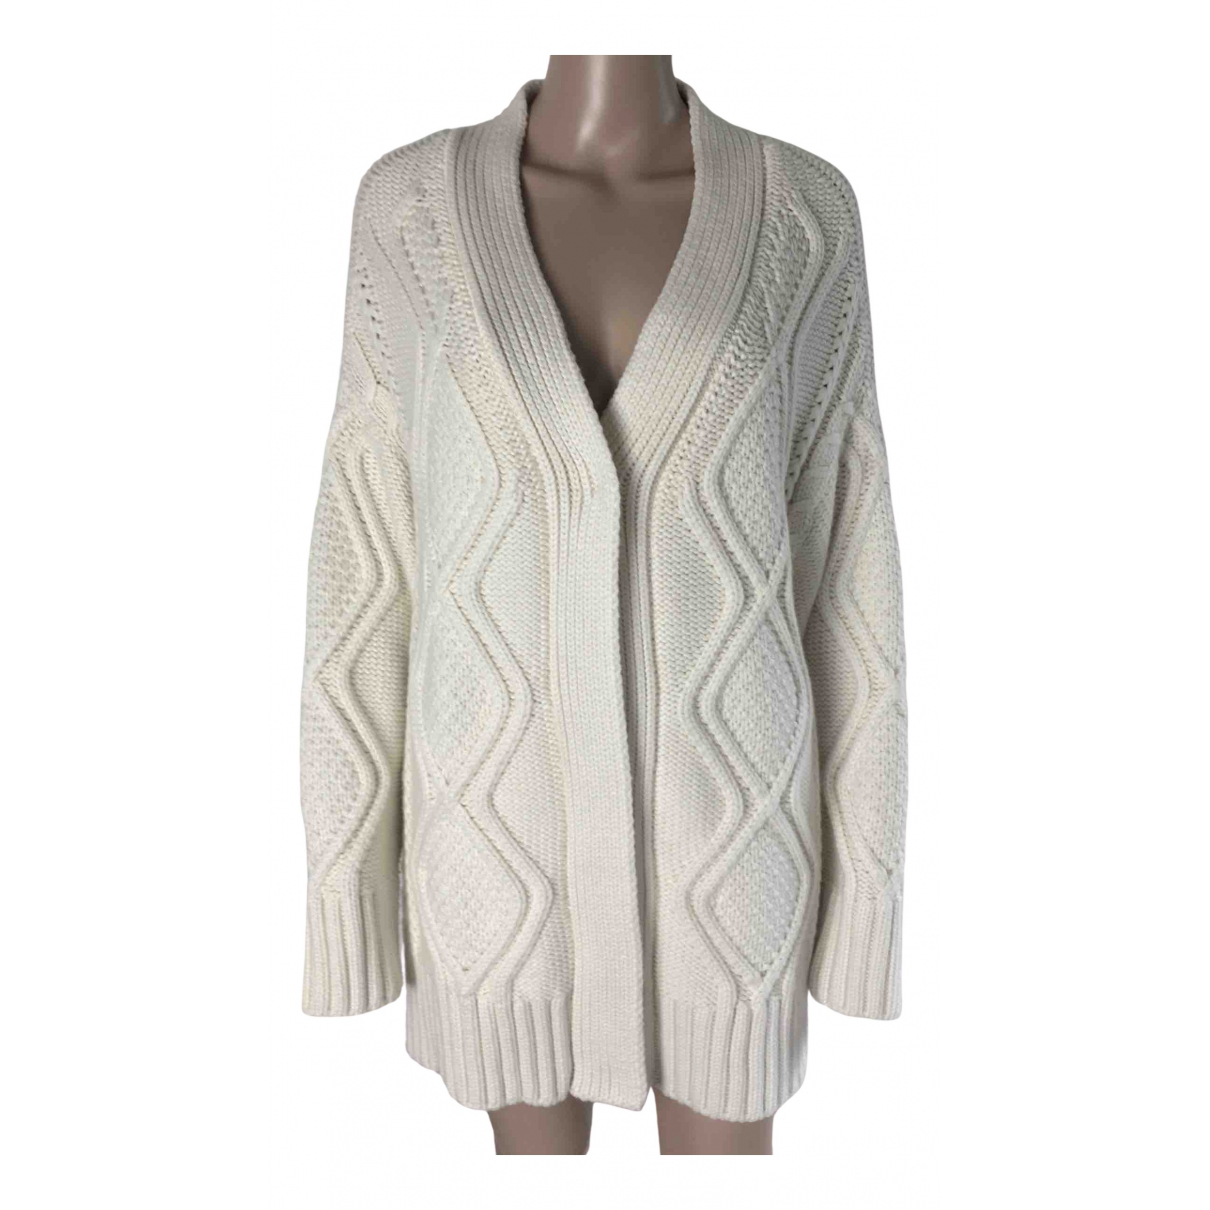 Roberto Cavalli N White Wool jacket for Women 42 IT